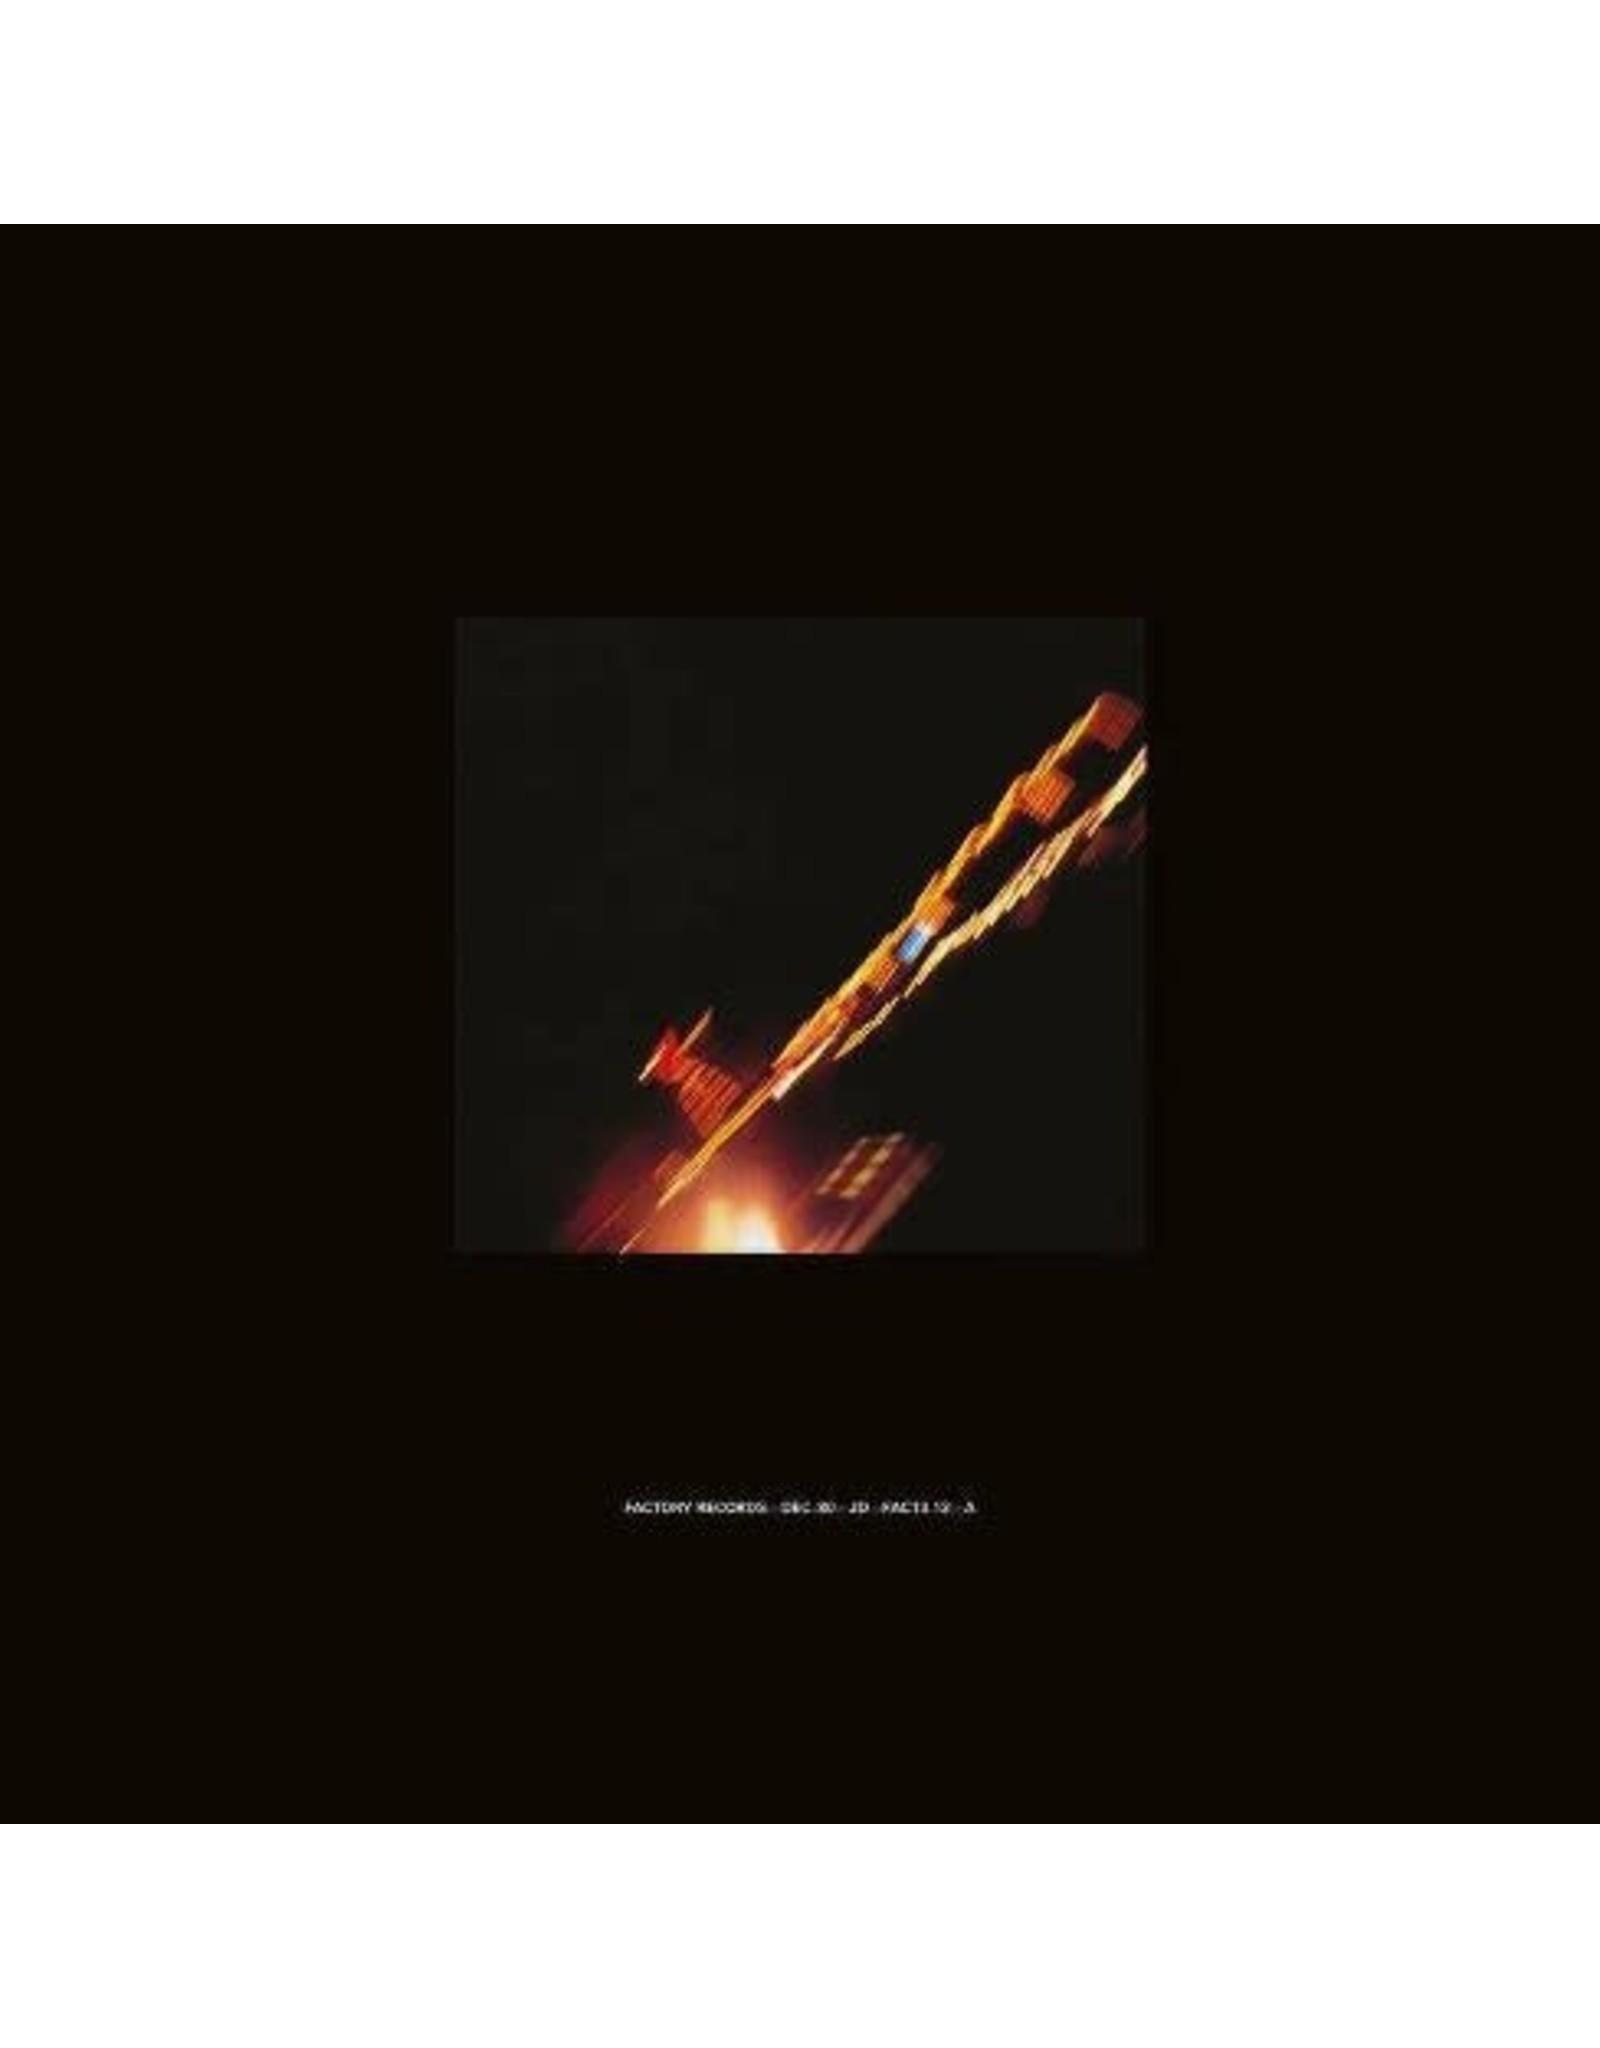 Joy Division - Transmission LP